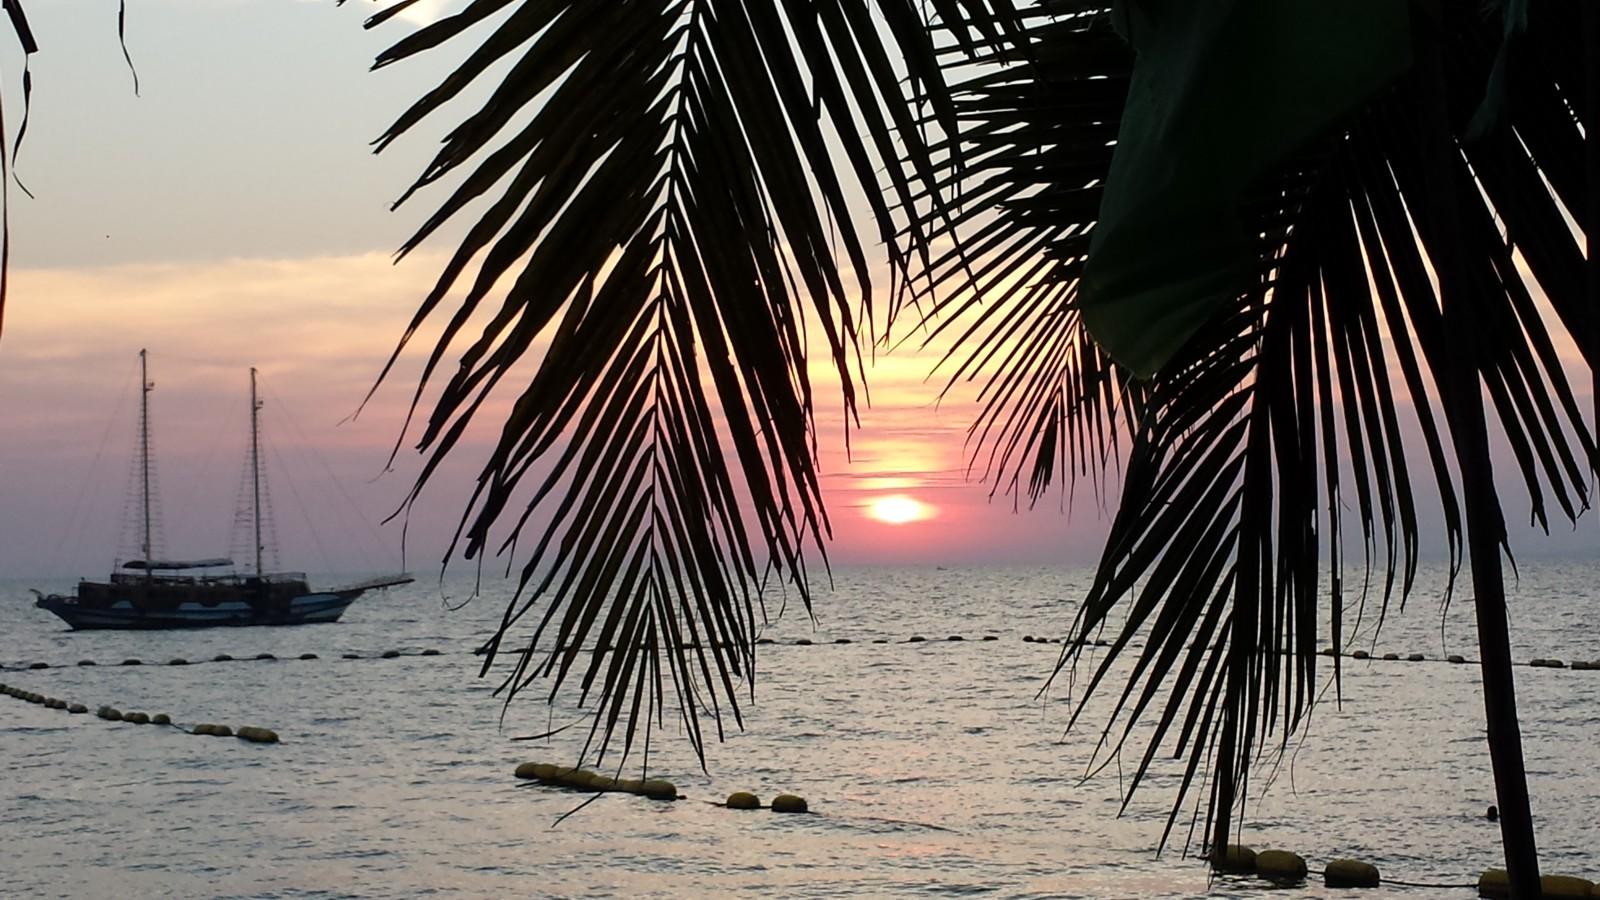 sailing sunset over the ocean Luvli GummiWerks